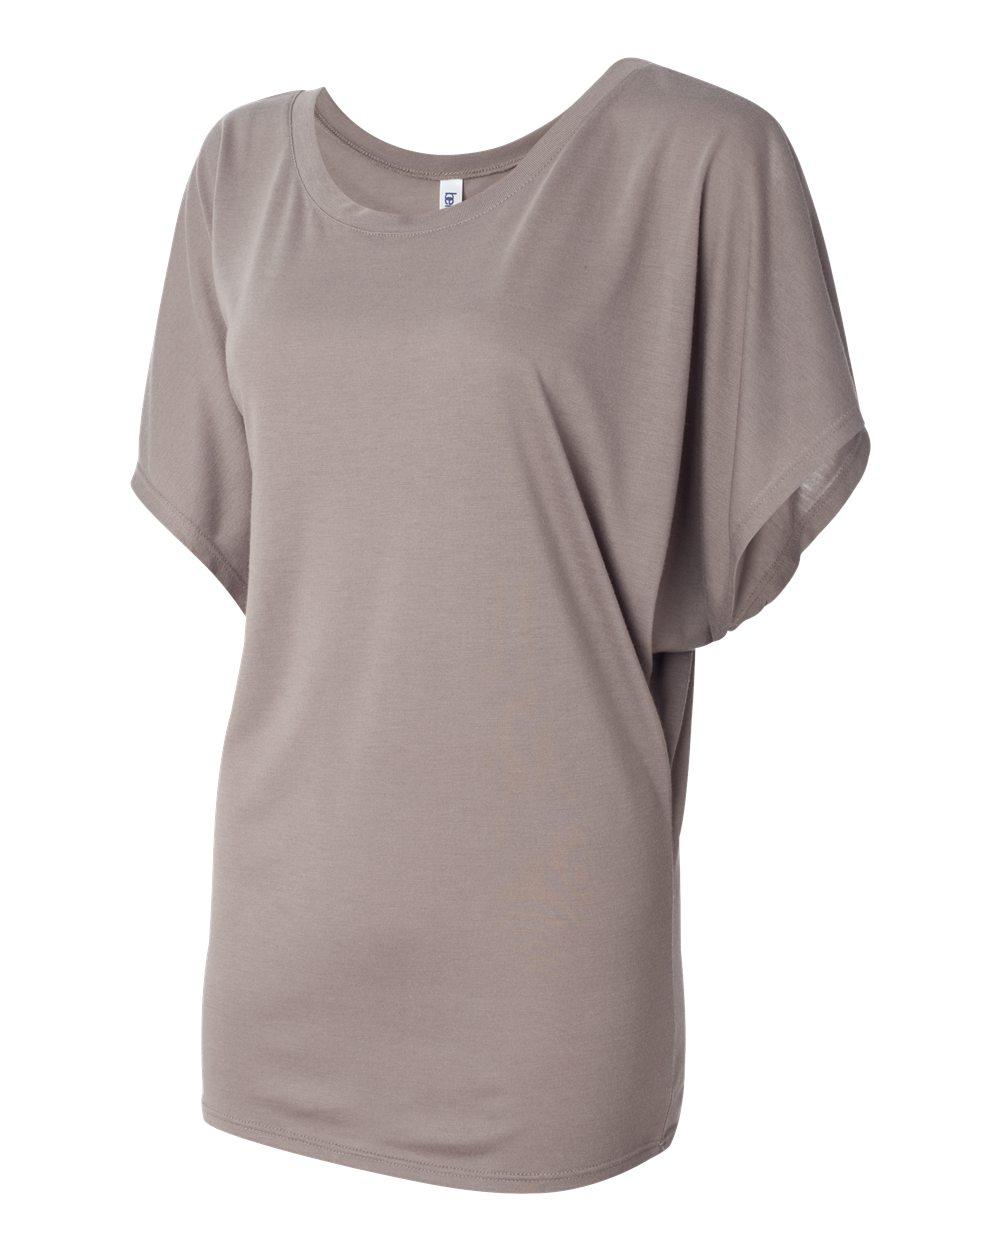 Bella-Canvas-Women-039-s-Flowy-Draped-Sleeve-Dolman-T-Shirt-8821-S-2XL thumbnail 6